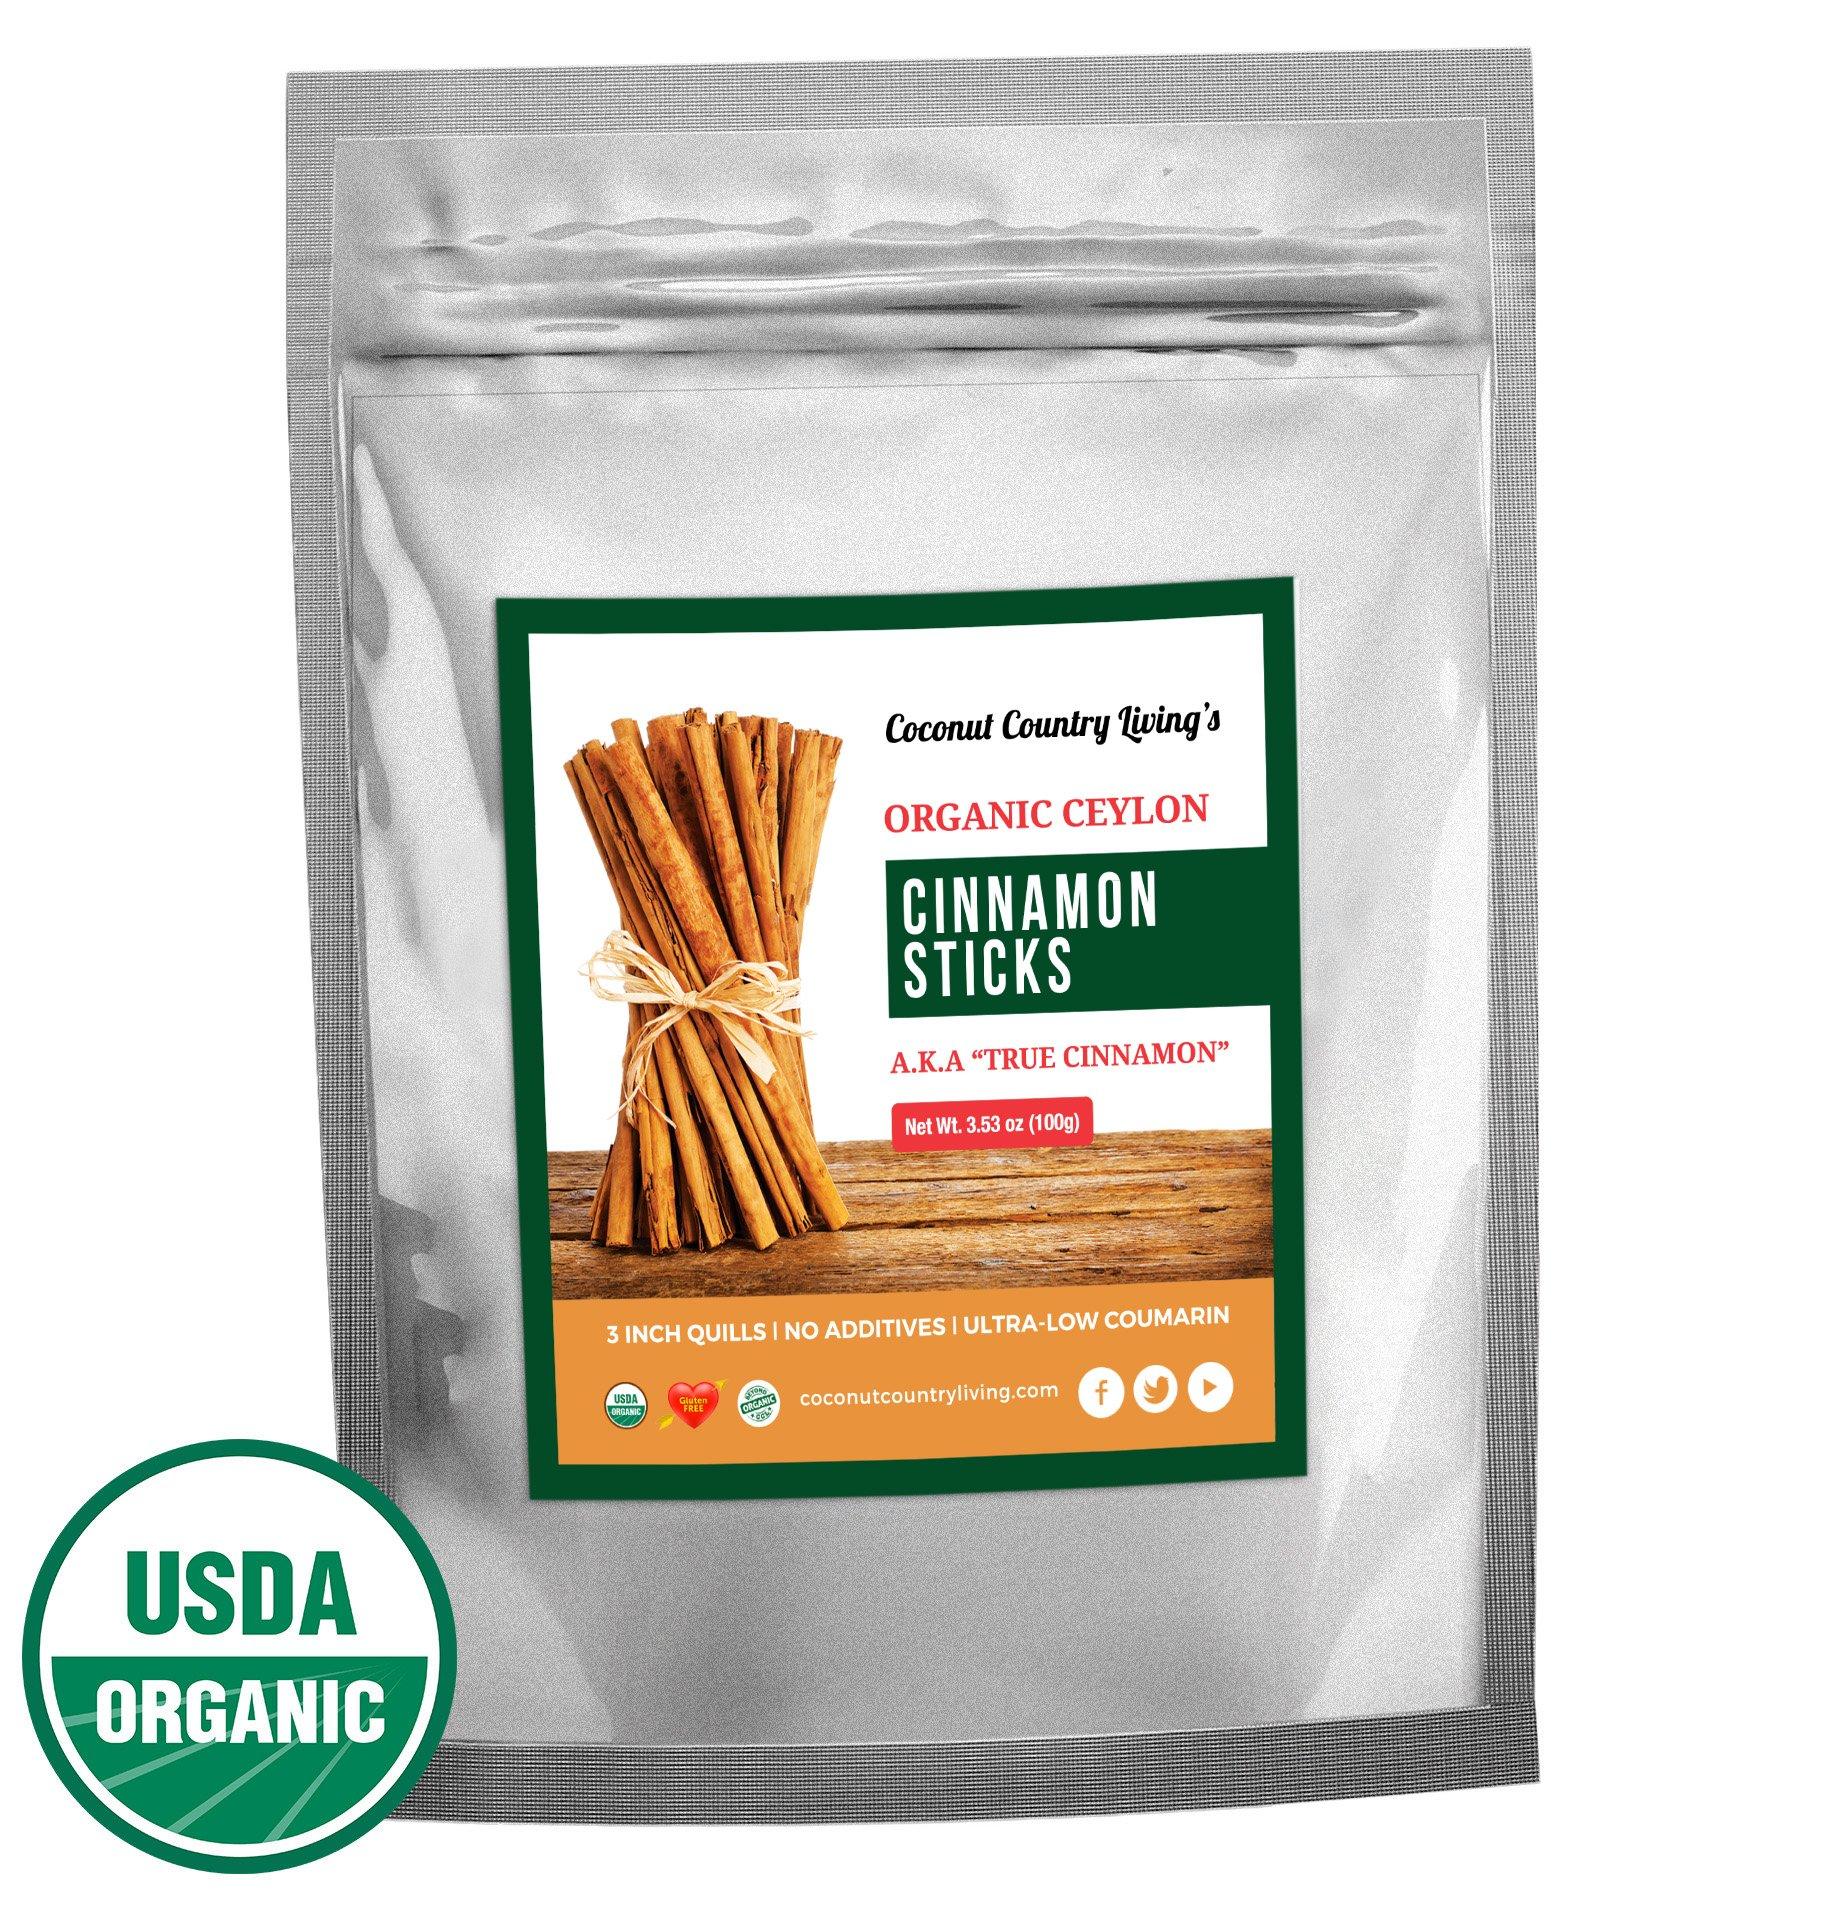 Organic Cinnamon Sticks Ceylon 3.5 oz Fairtrade, Freshly Harvested in Ceylon w/E-BOOK